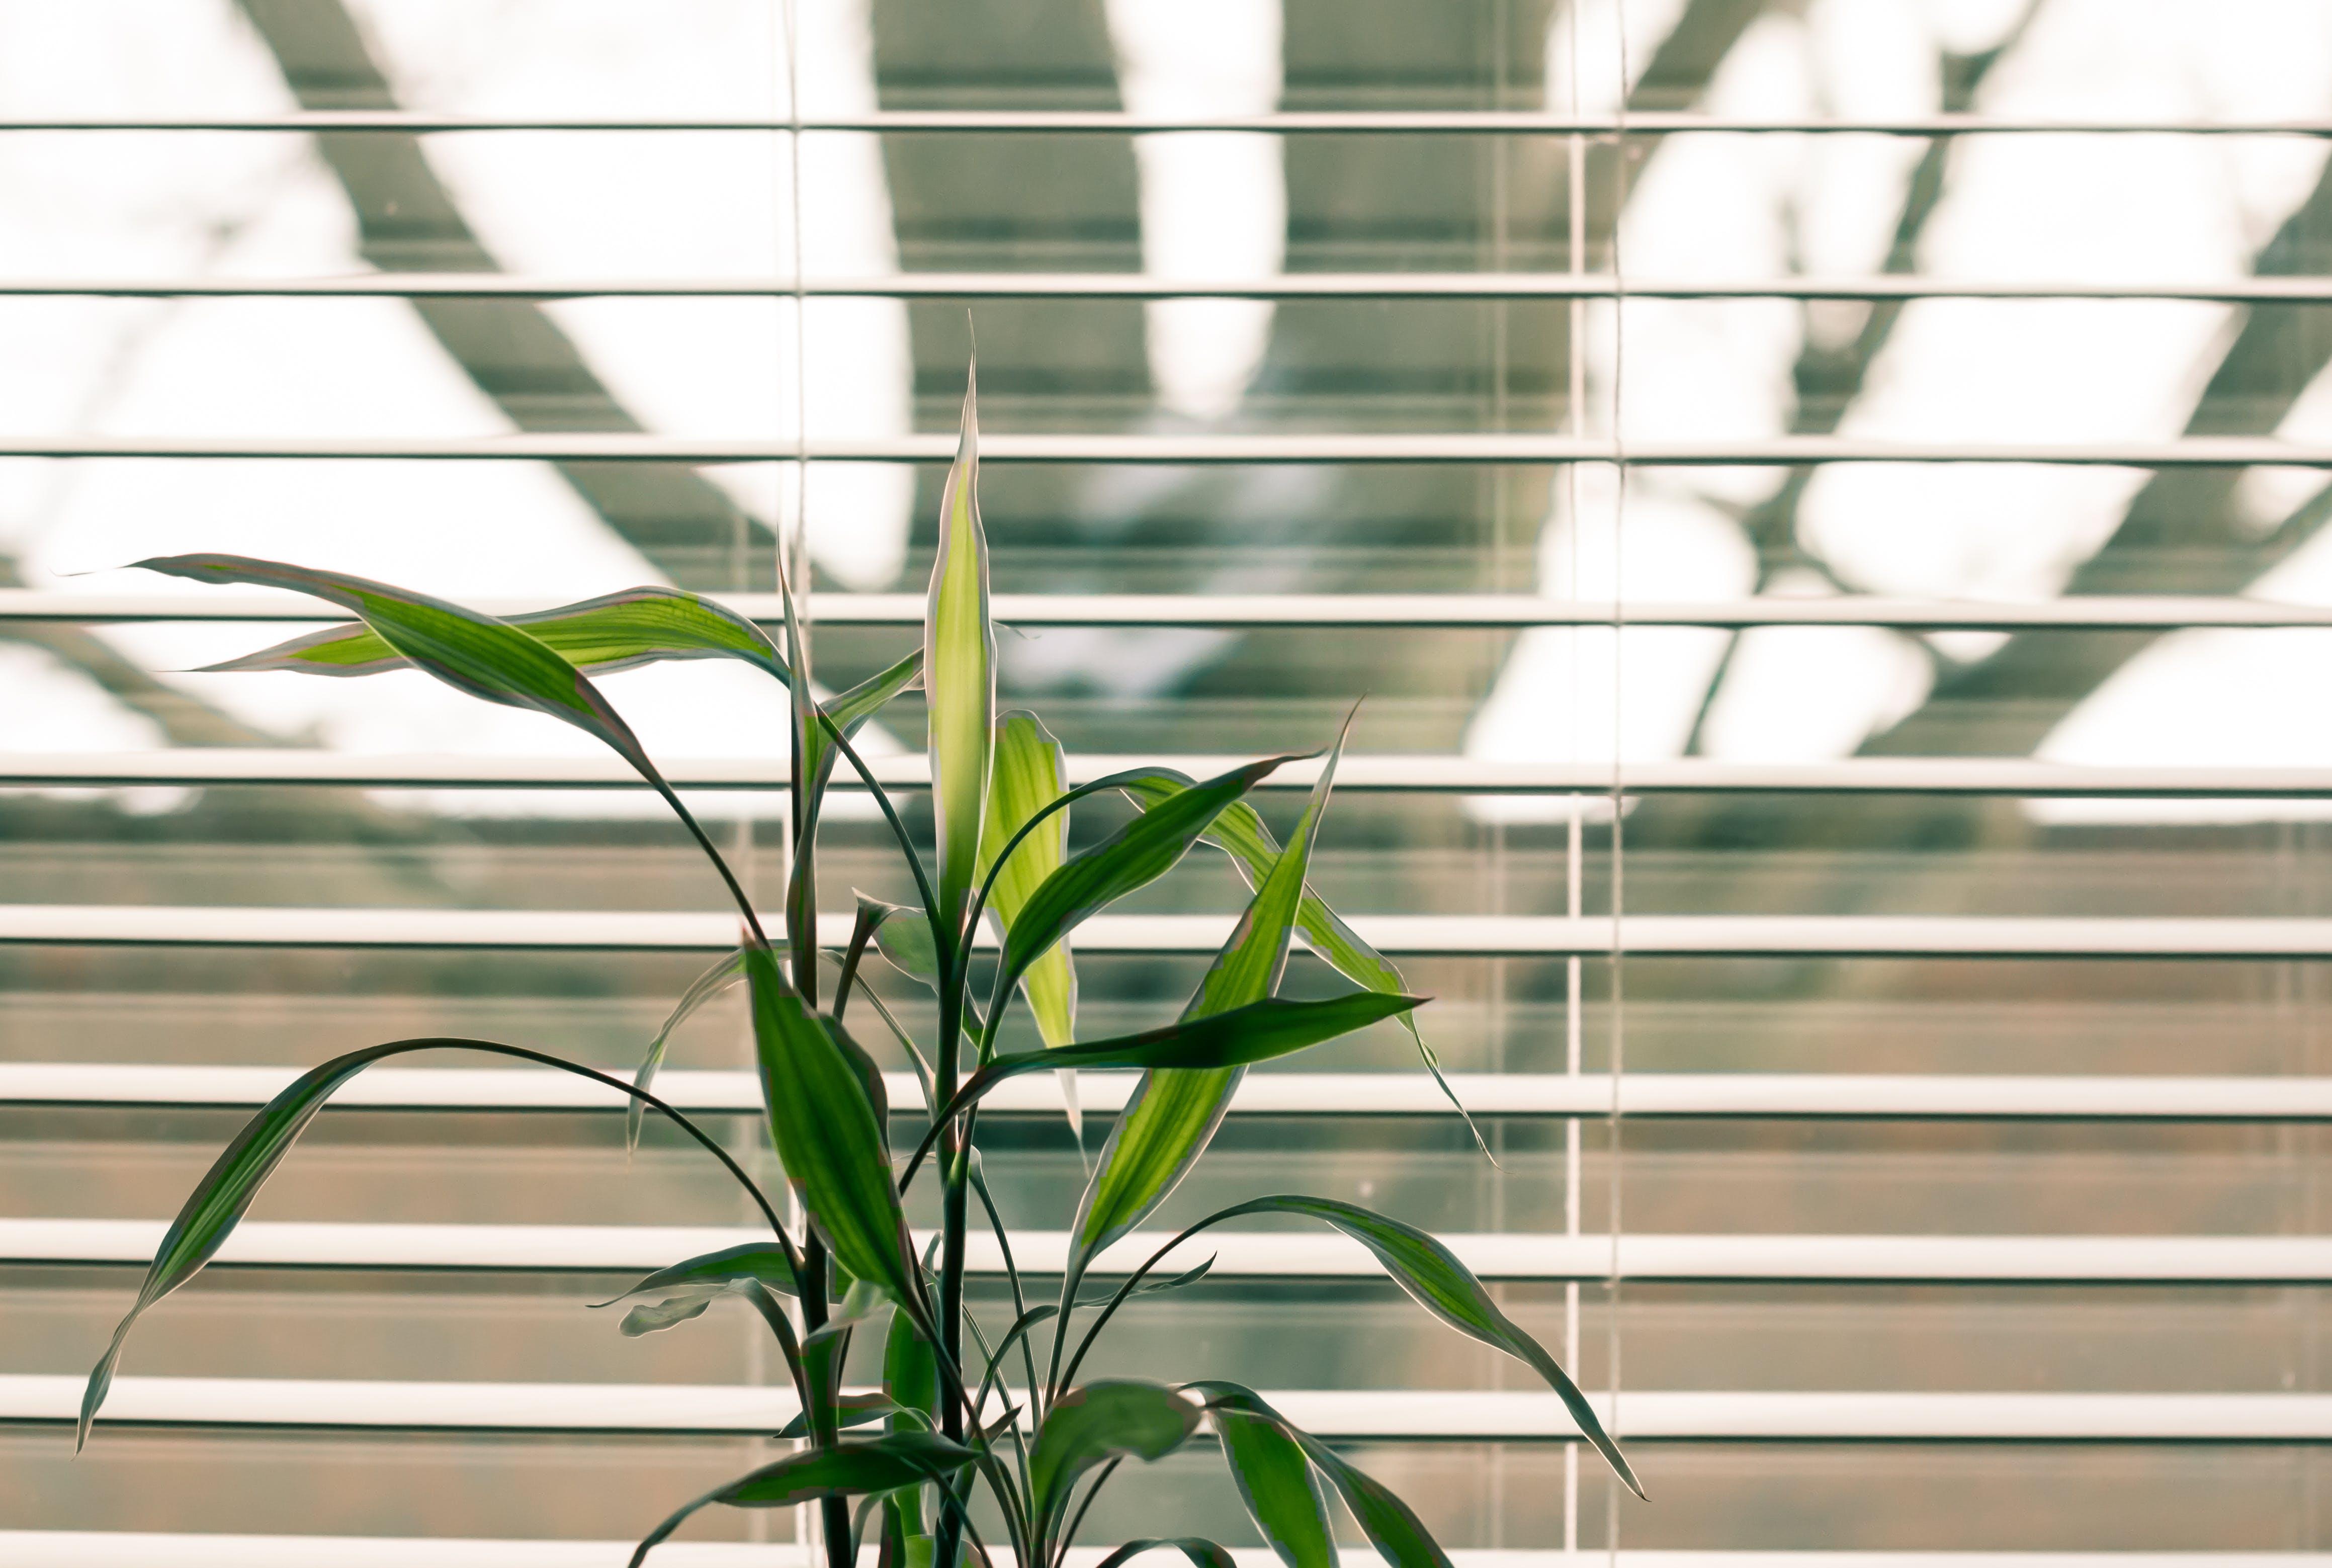 Green Leaf Plant Against White Venetian Window Blinds